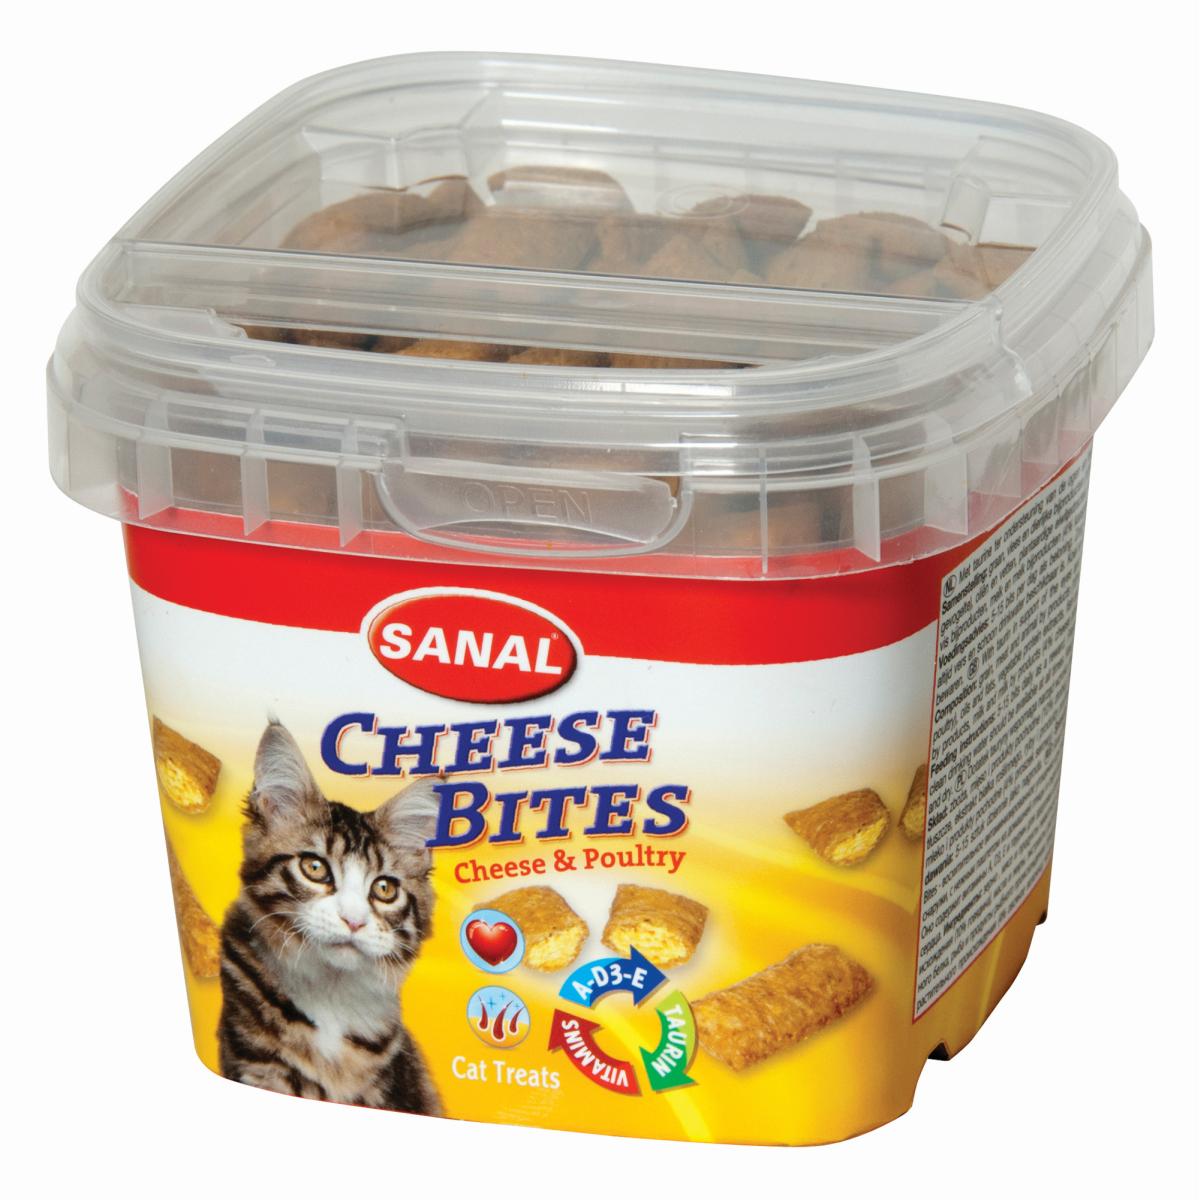 Cheese bites cup meerkleurig 75 gr